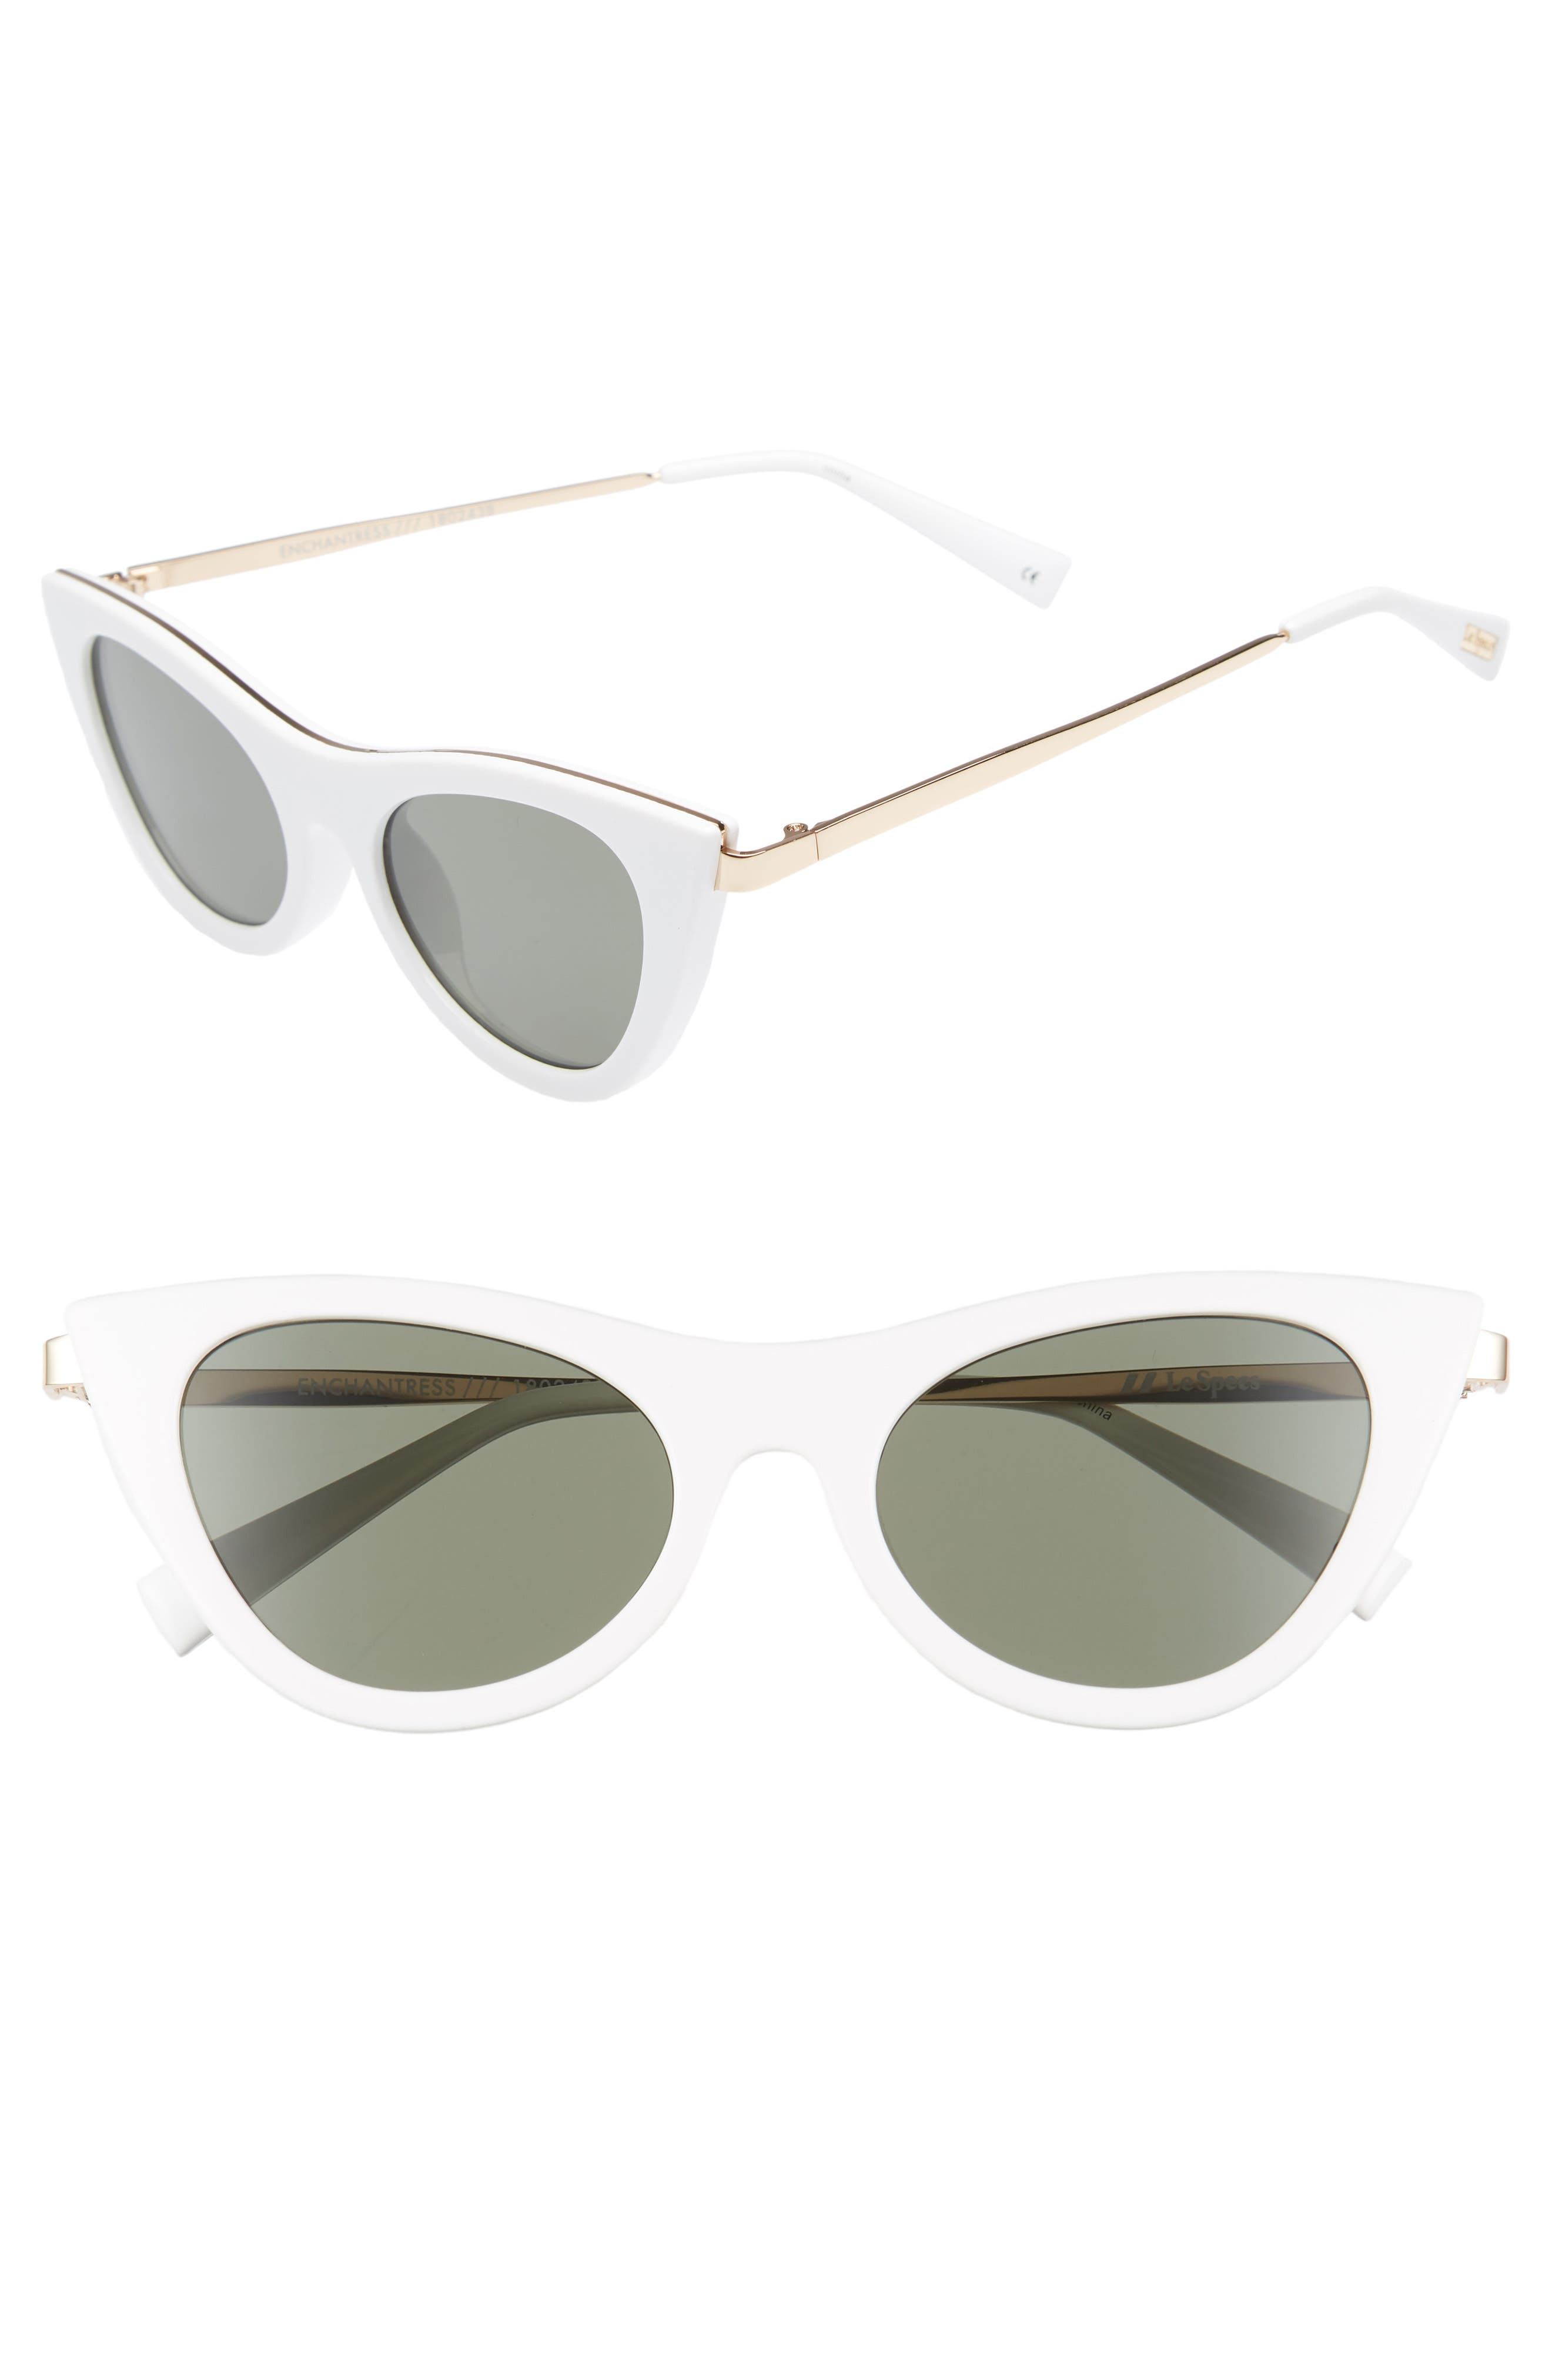 LE SPECS Enchantress 50mm Cat Eye Sunglasses, Main, color, 100